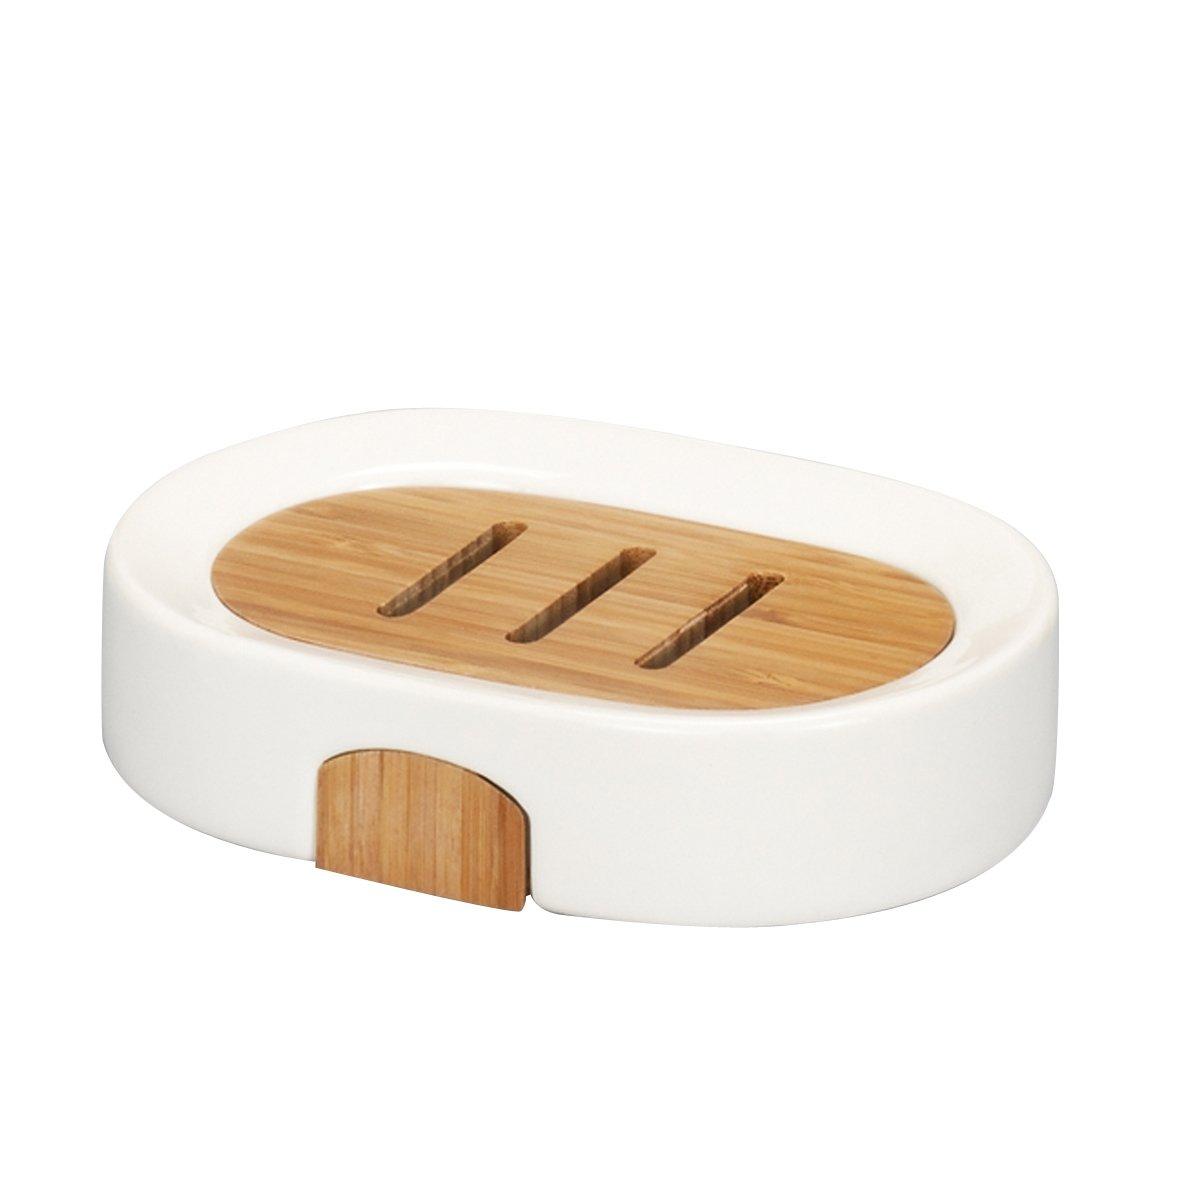 Zeller 18350 Seifenschale, Keramik / Bamboo